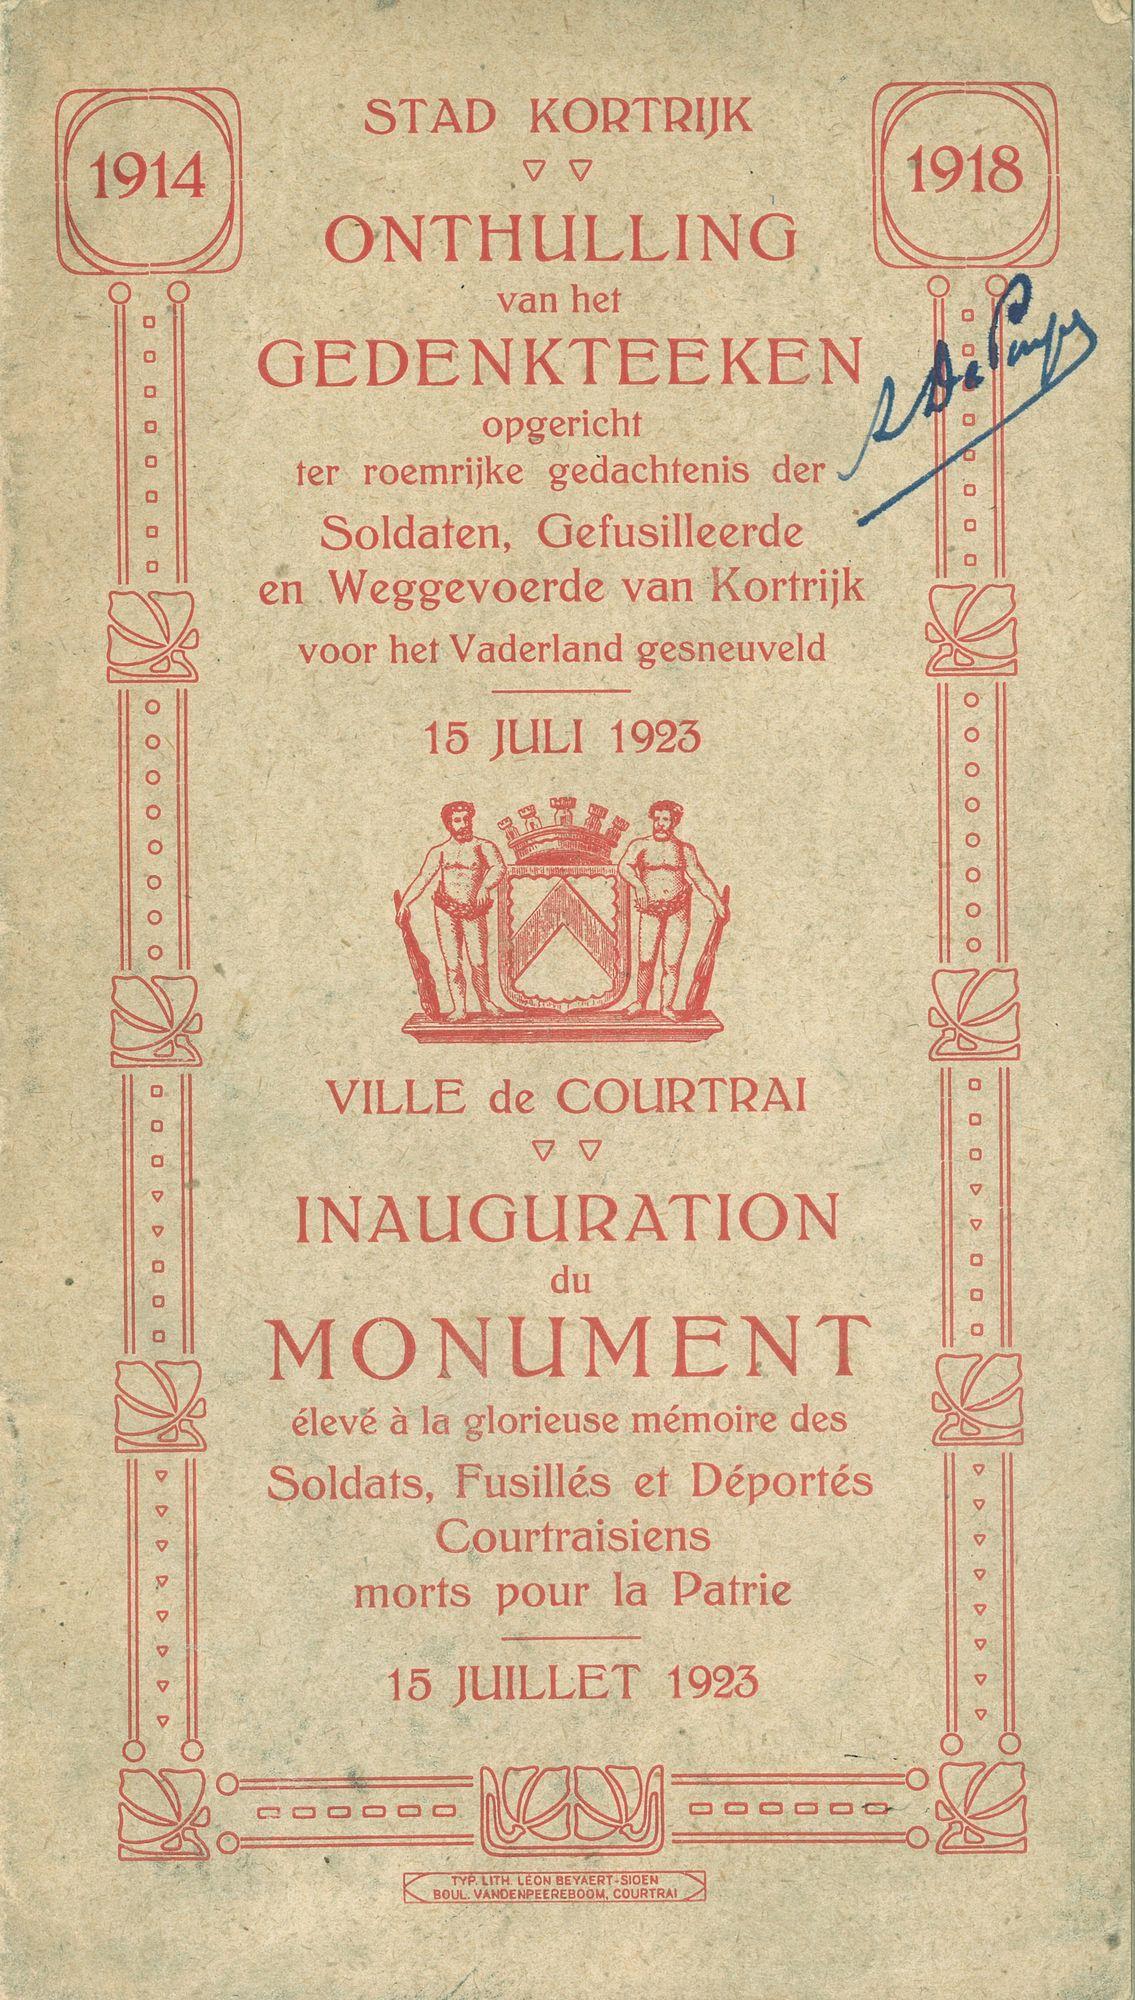 Onthulling gedenkteken in 1923